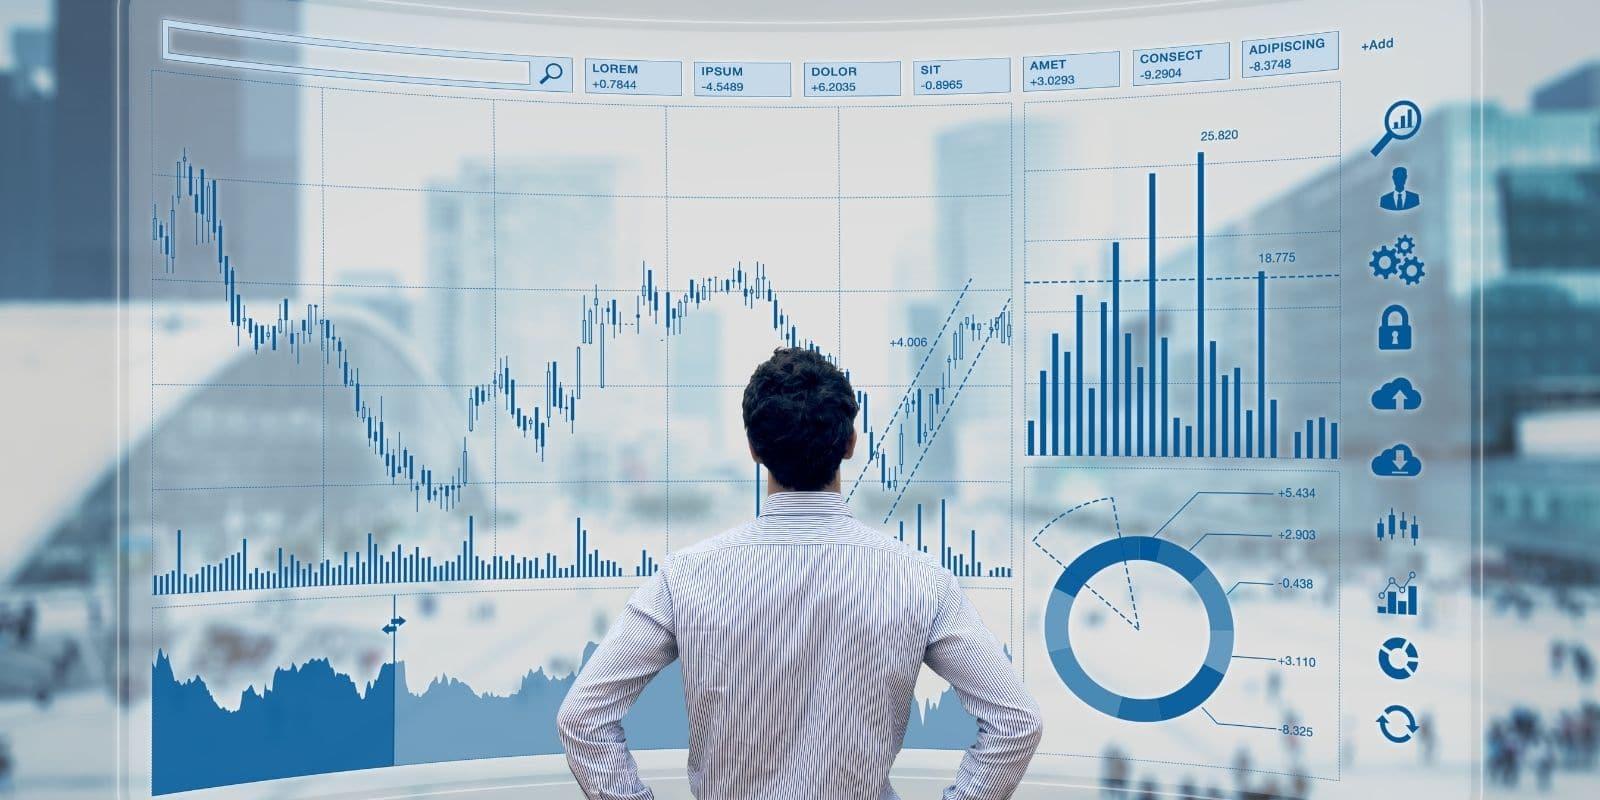 investisseur tech semaine 20 - spacs